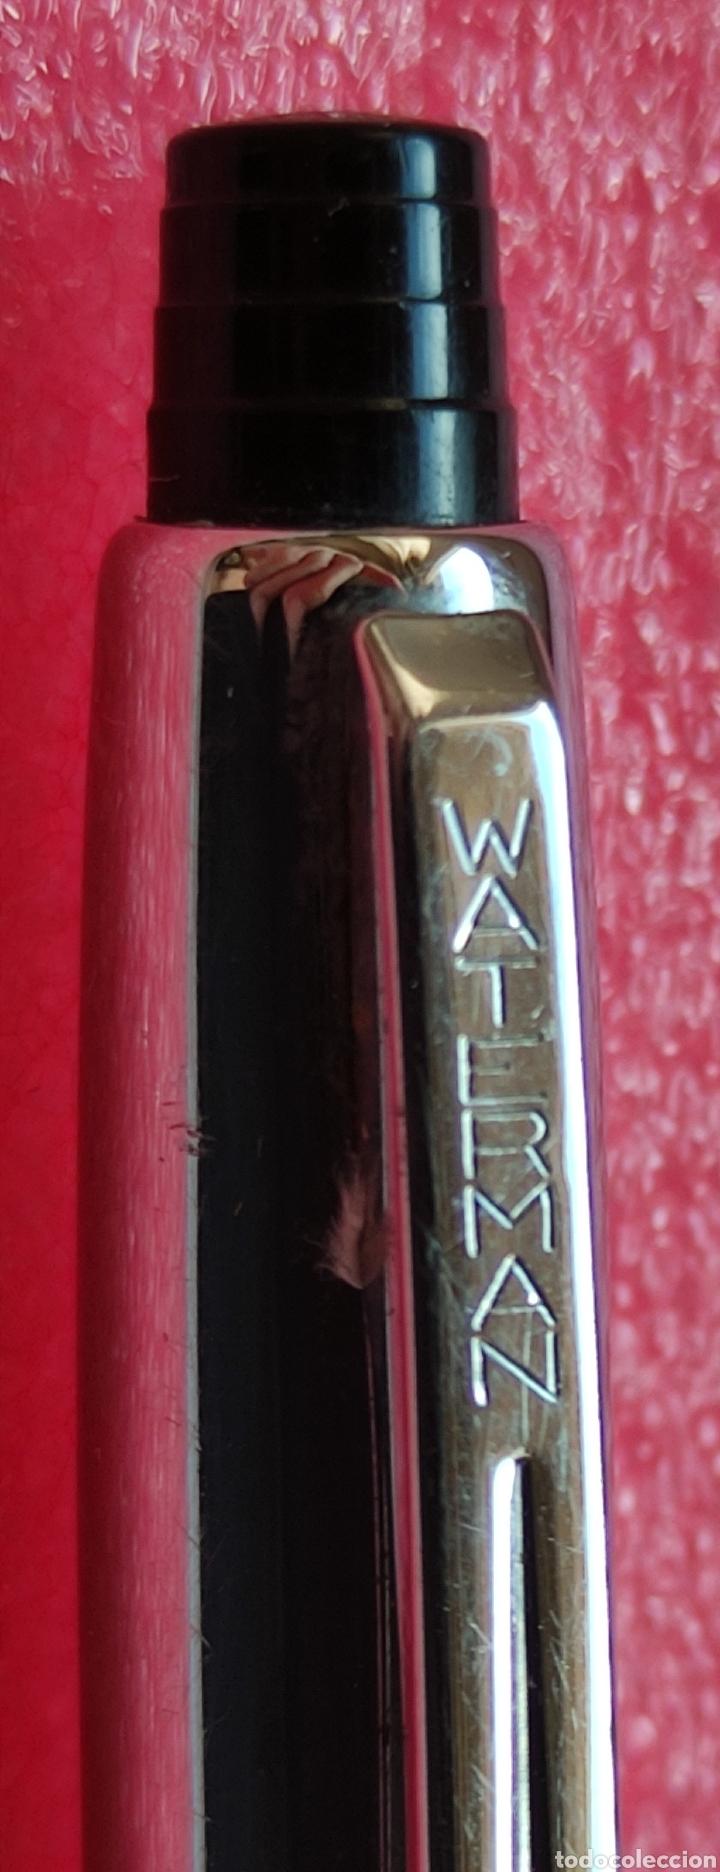 Bolígrafos antiguos: Bolígrafo WATERMAN - Foto 3 - 261843780